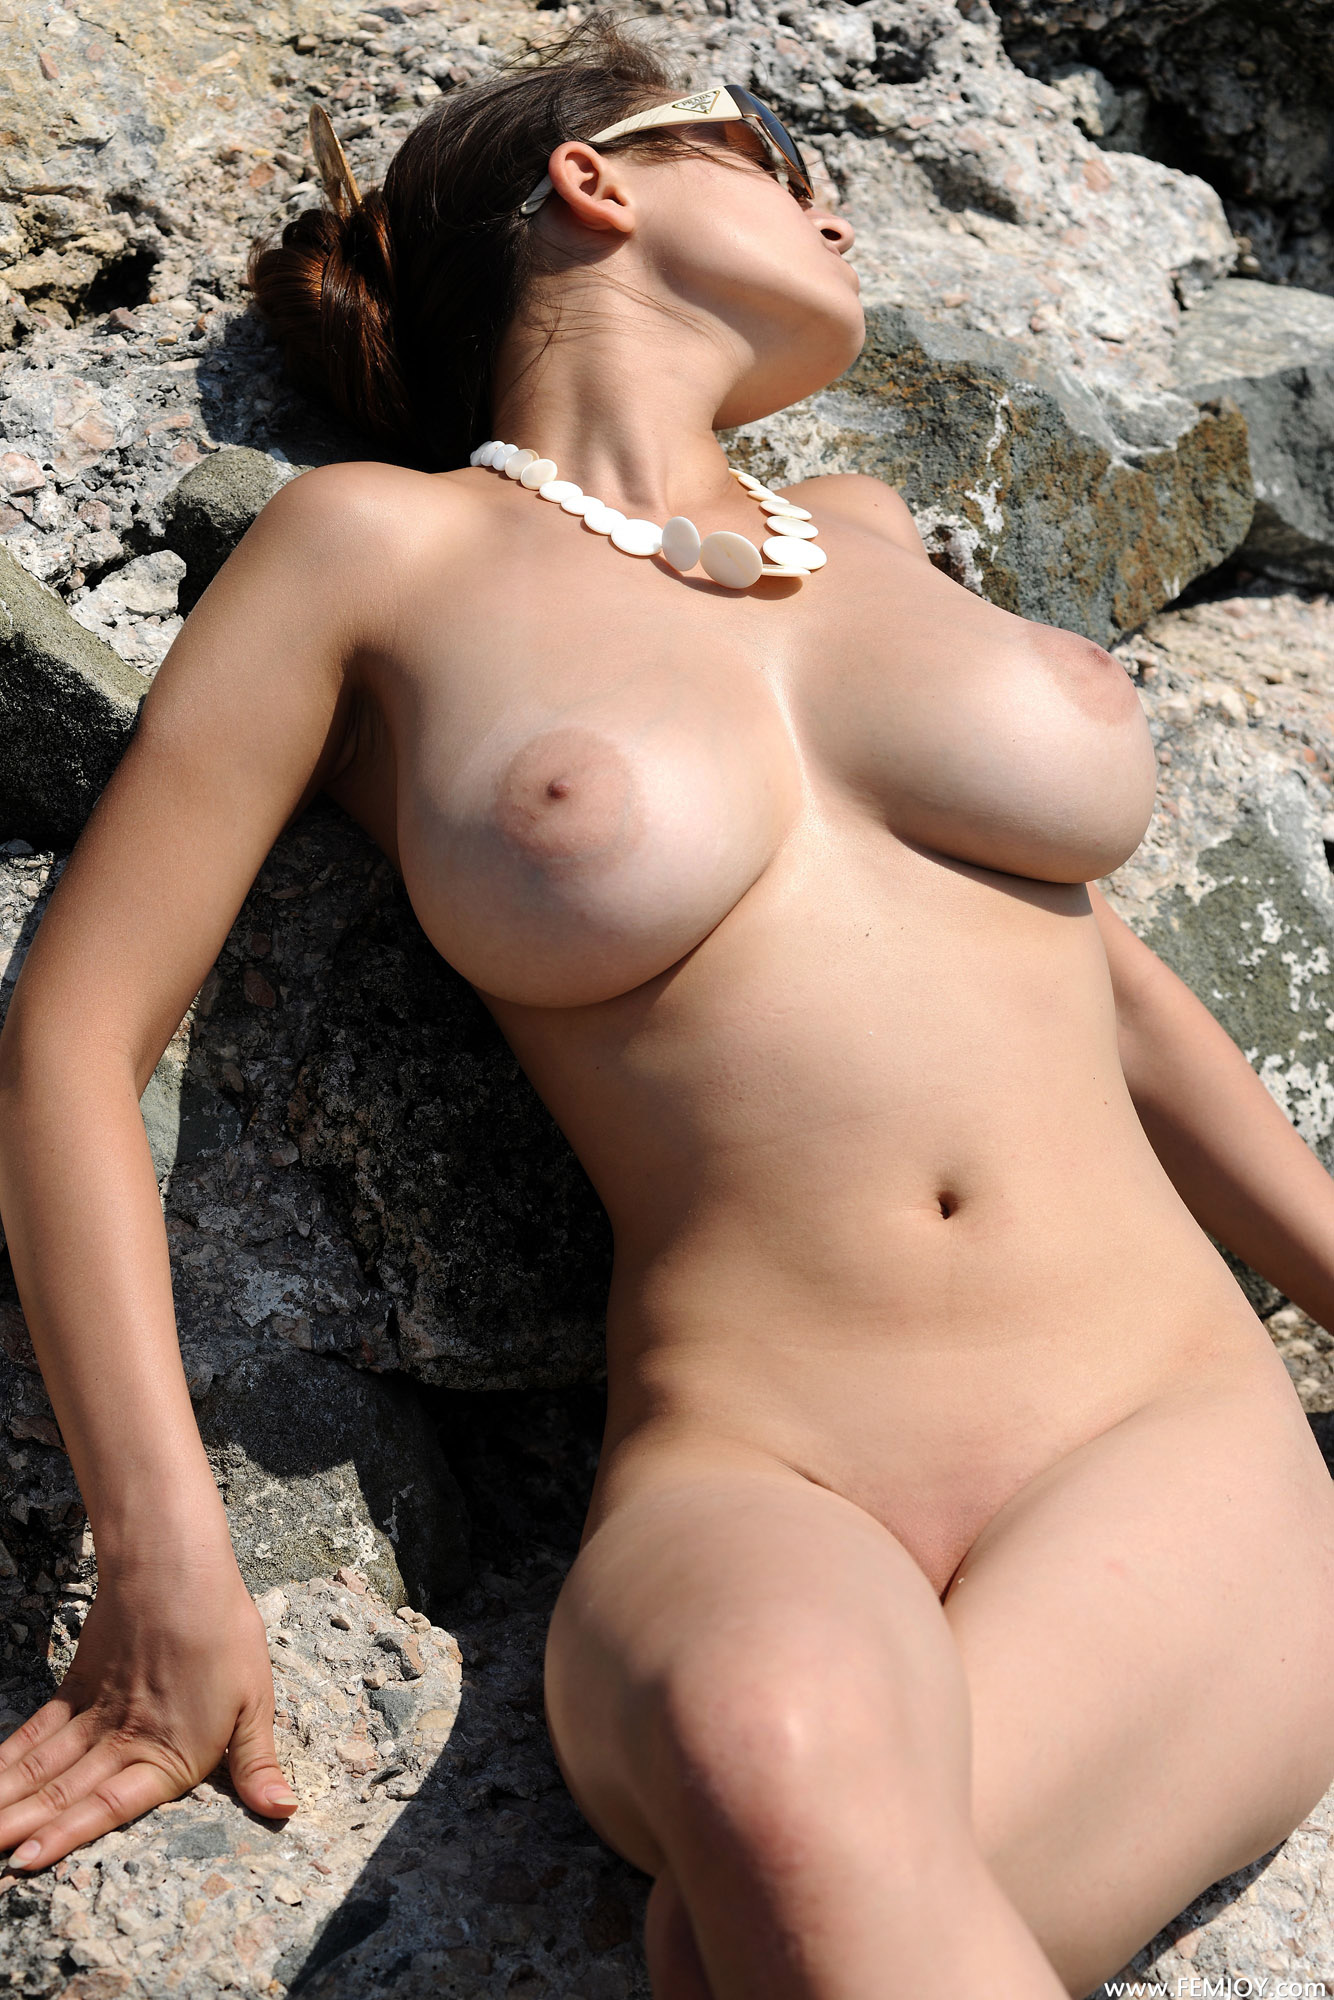 Fat Women Nude Image